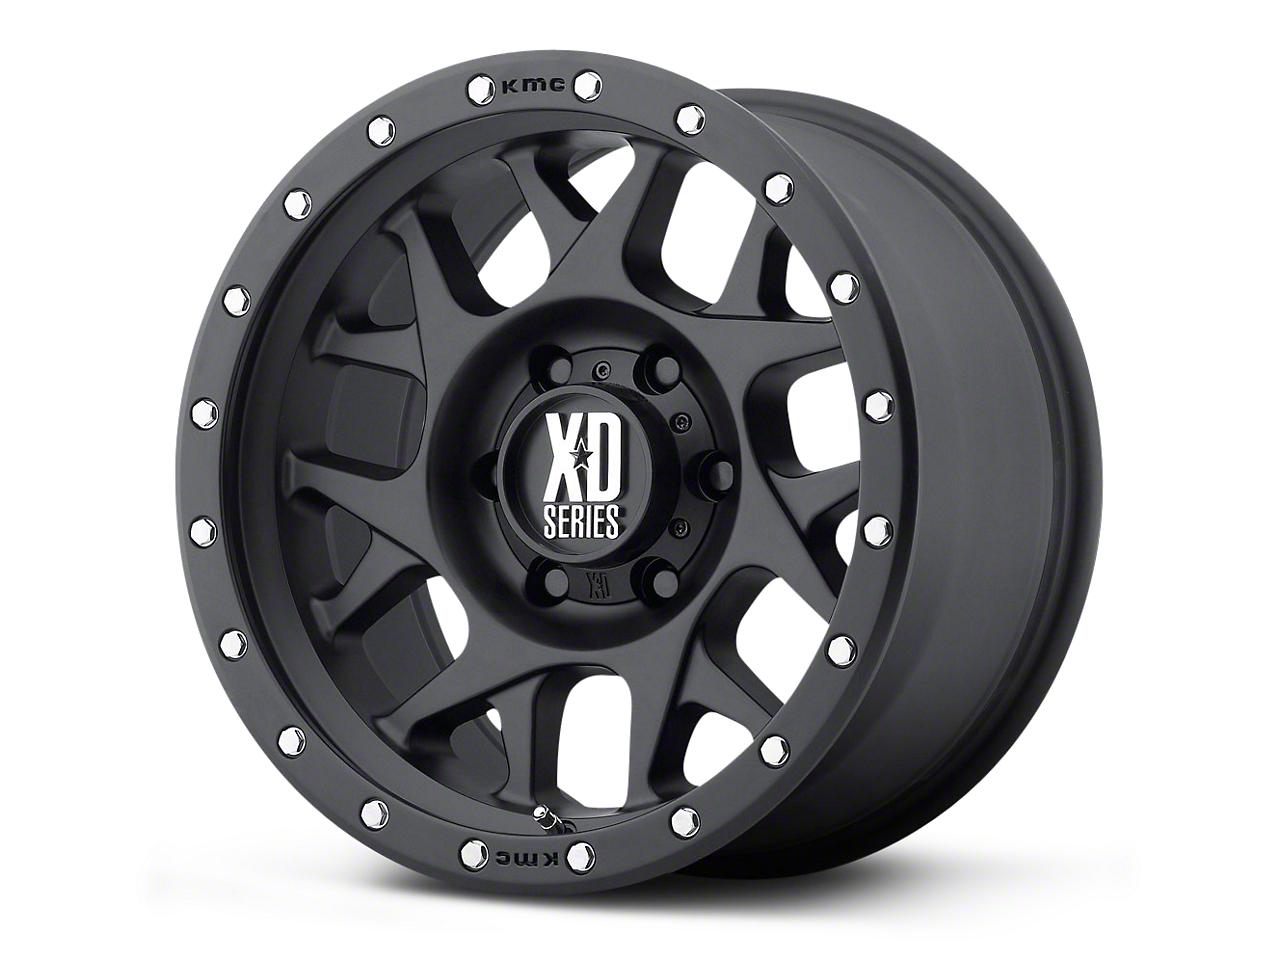 XD Bully Satin Black 5-Lug Wheel - 20x10 (02-18 RAM 1500, Excluding Mega Cab)